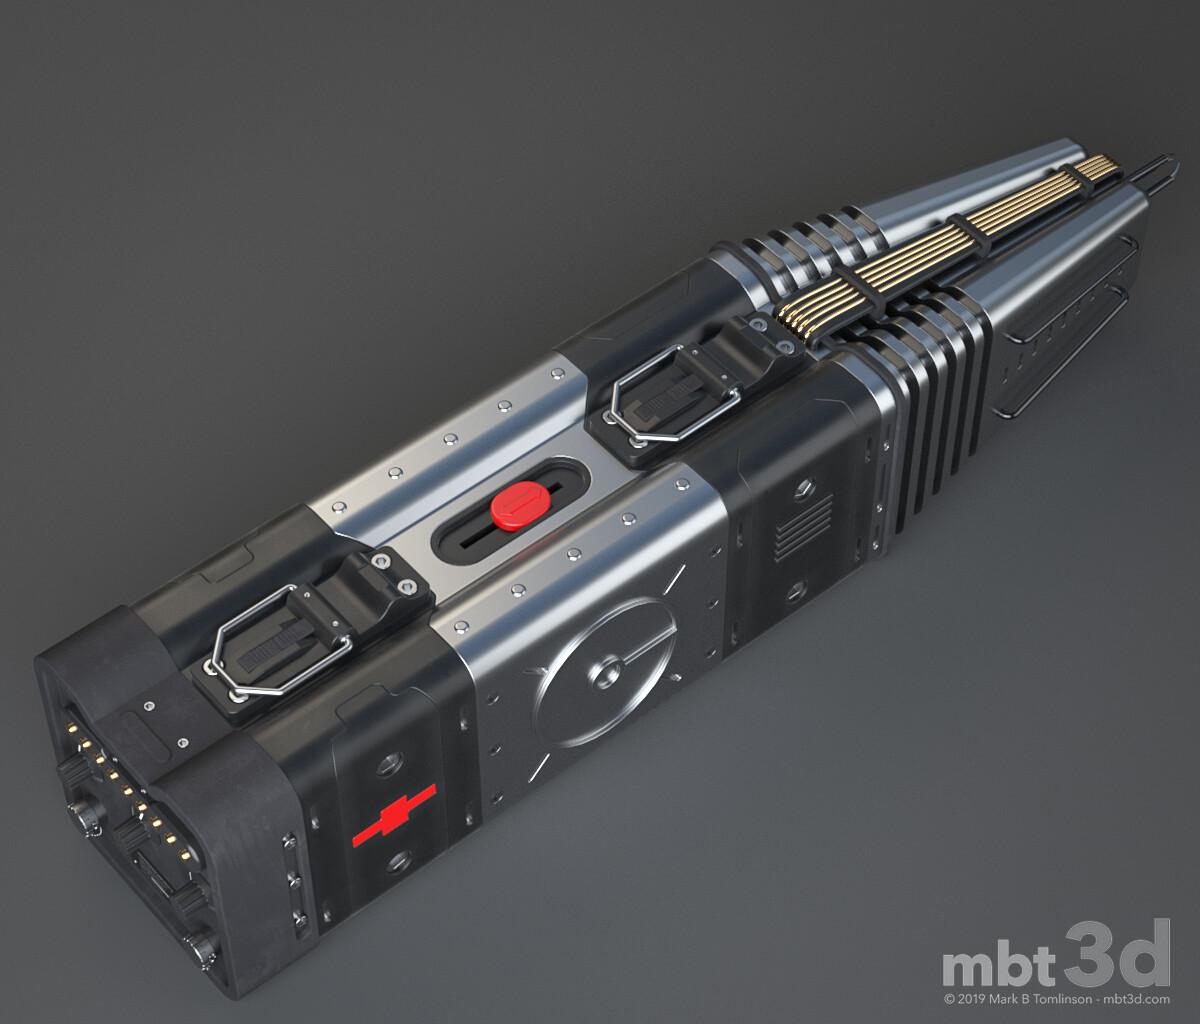 Mark b tomlinson module two 06